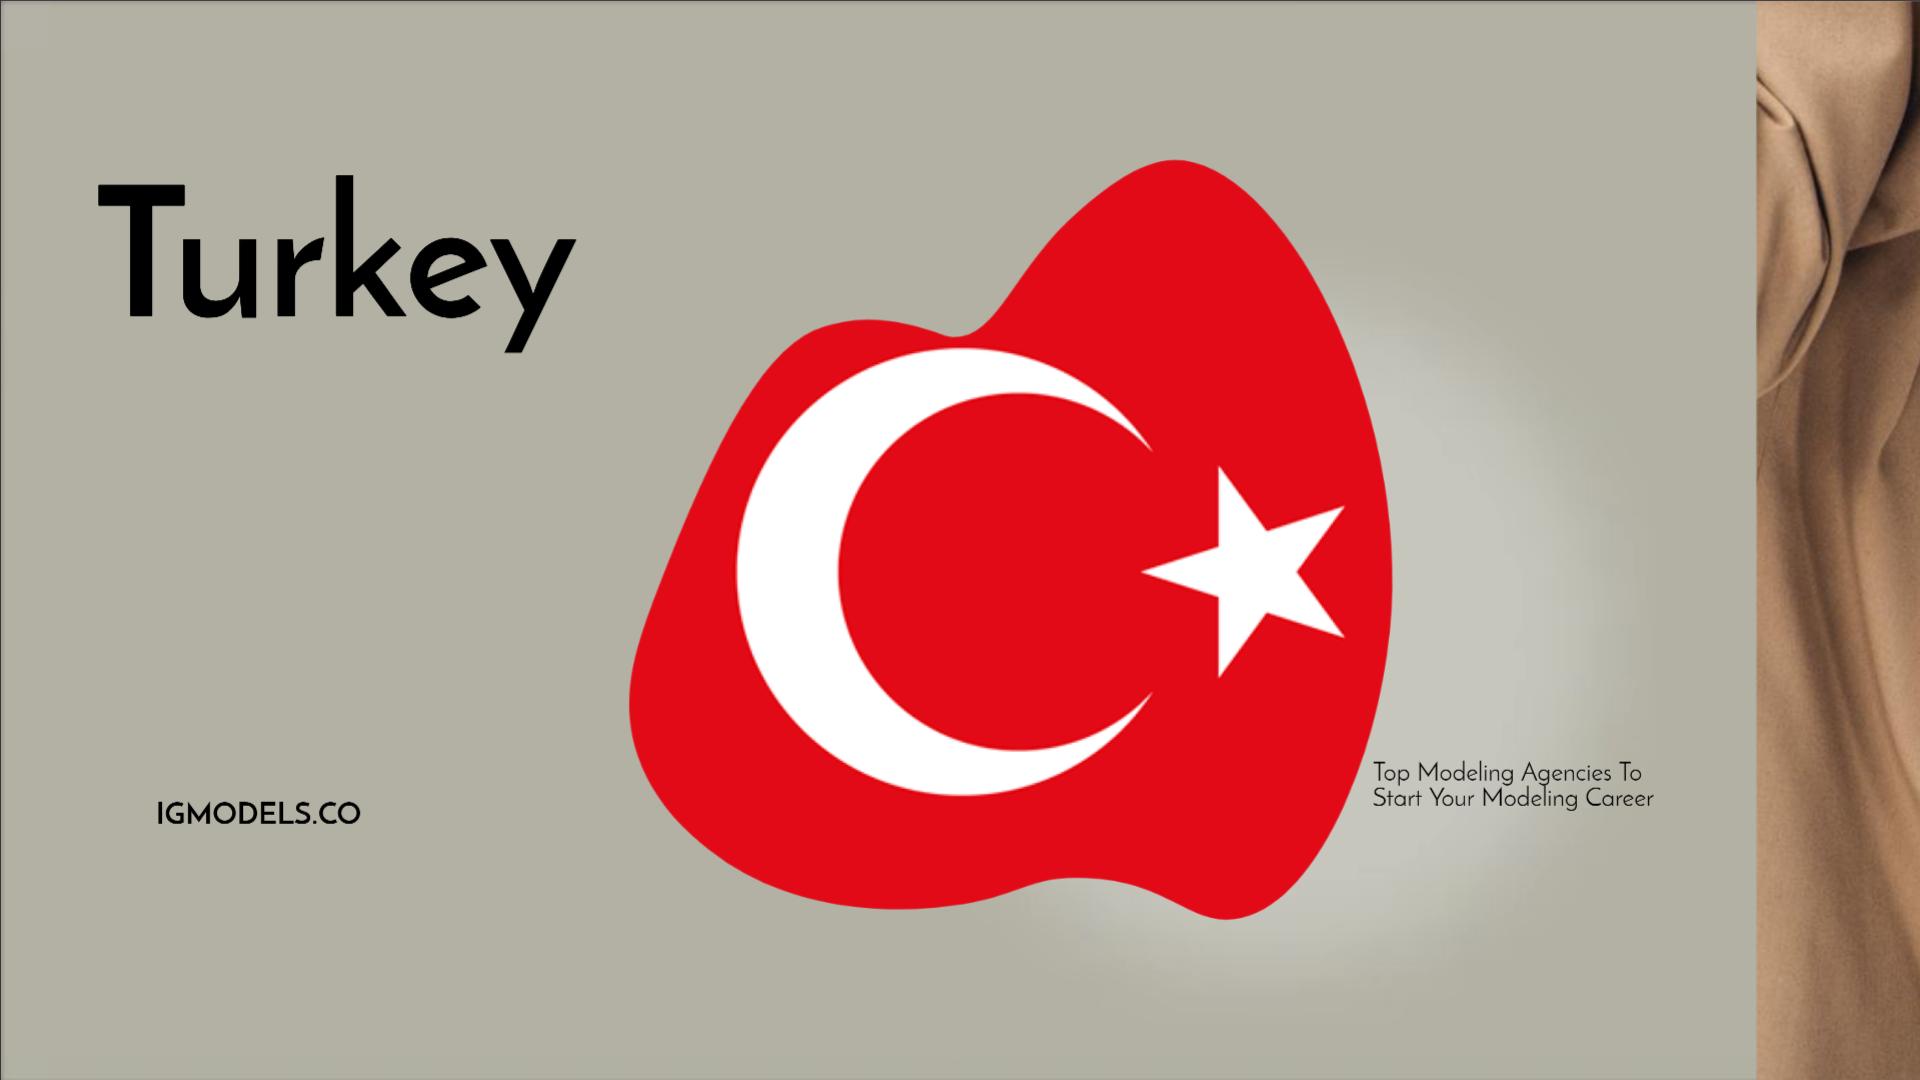 List : Top 35 Modeling Agencies In Turkey To Start Your Modeling Career In 2021